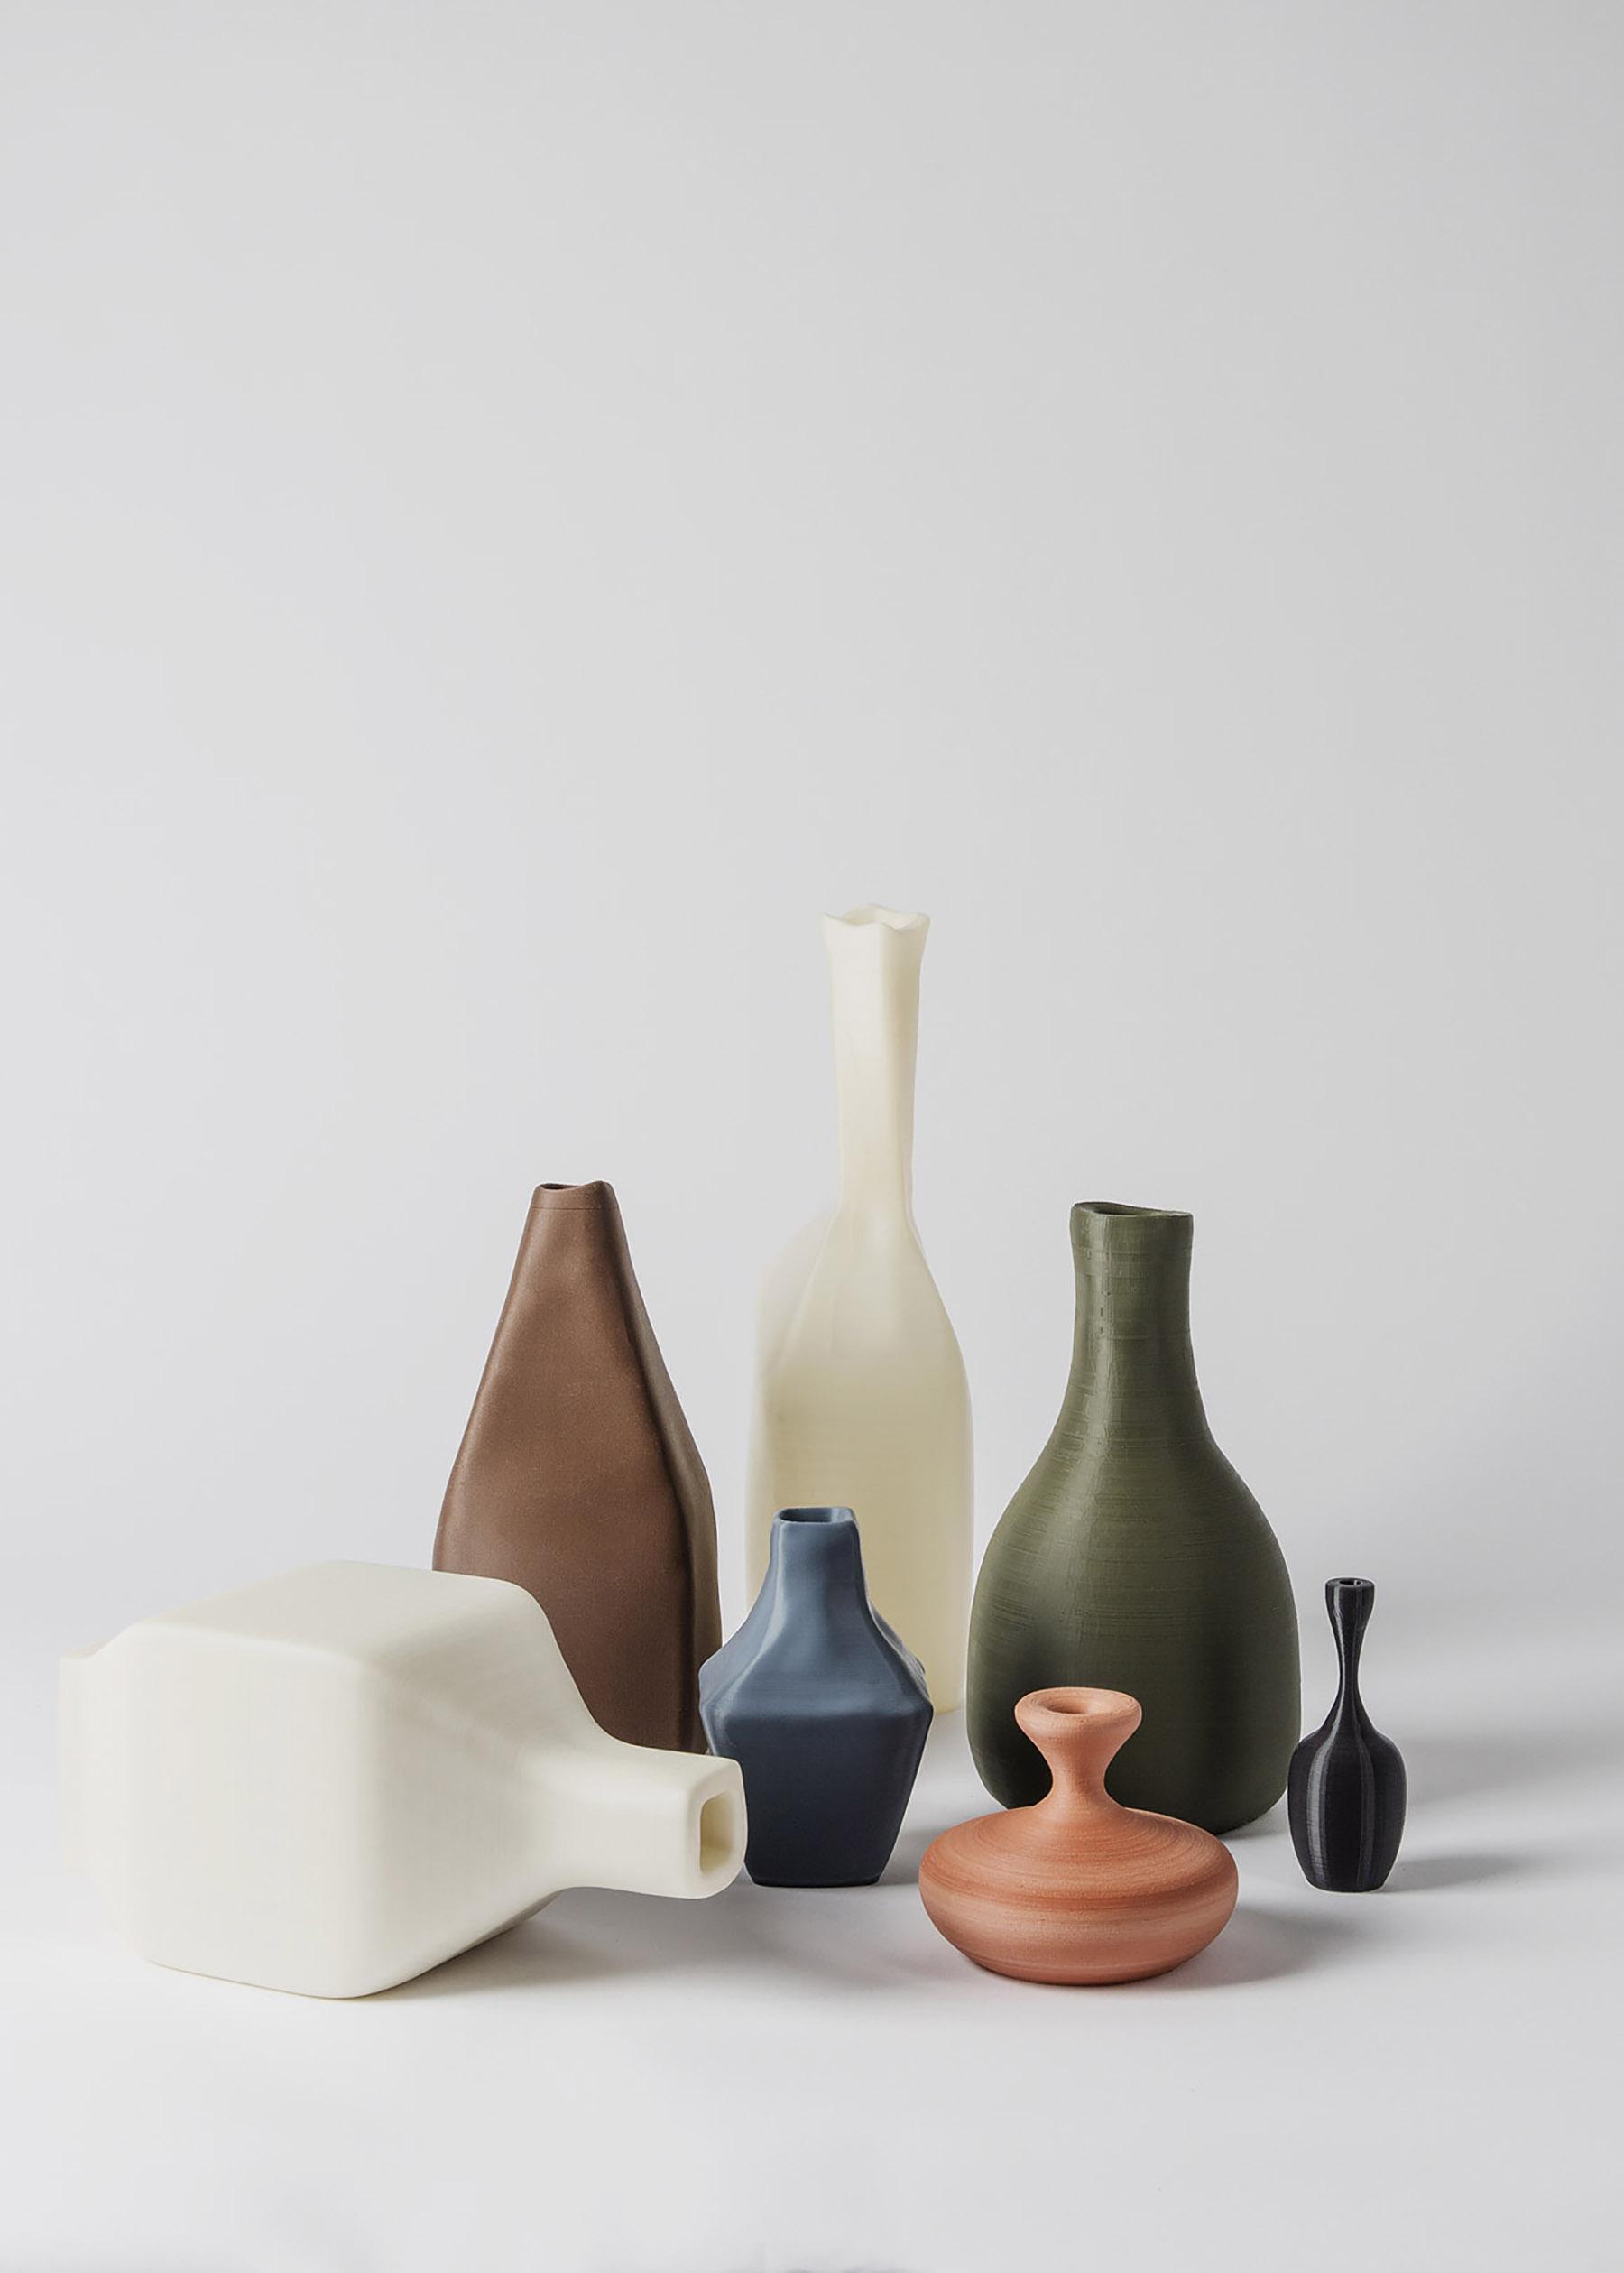 iGNANT-Design-Wang-Söderström-Table-101-003